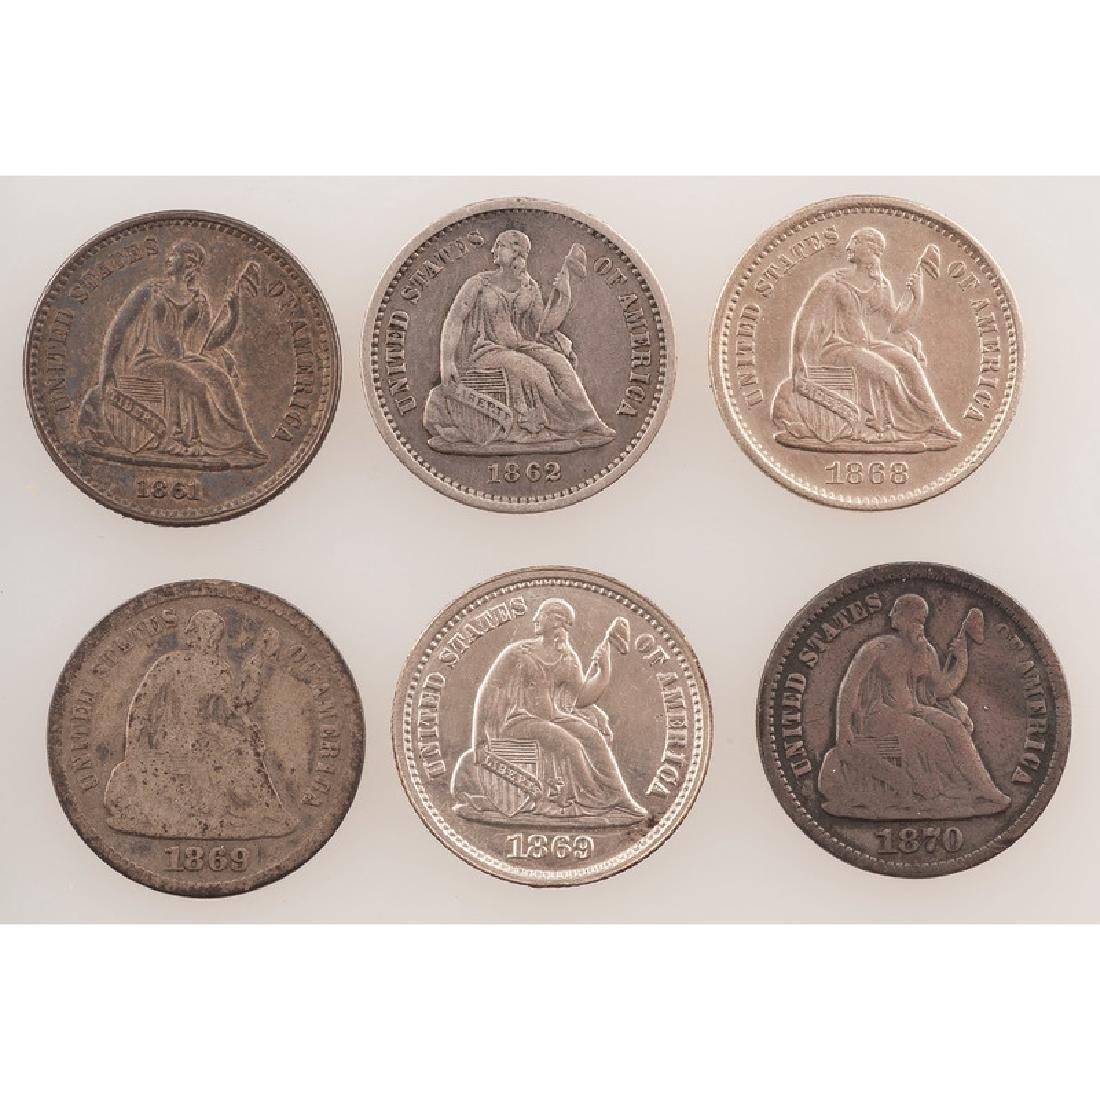 United States Liberty Seated Half Dimes 1861-1870